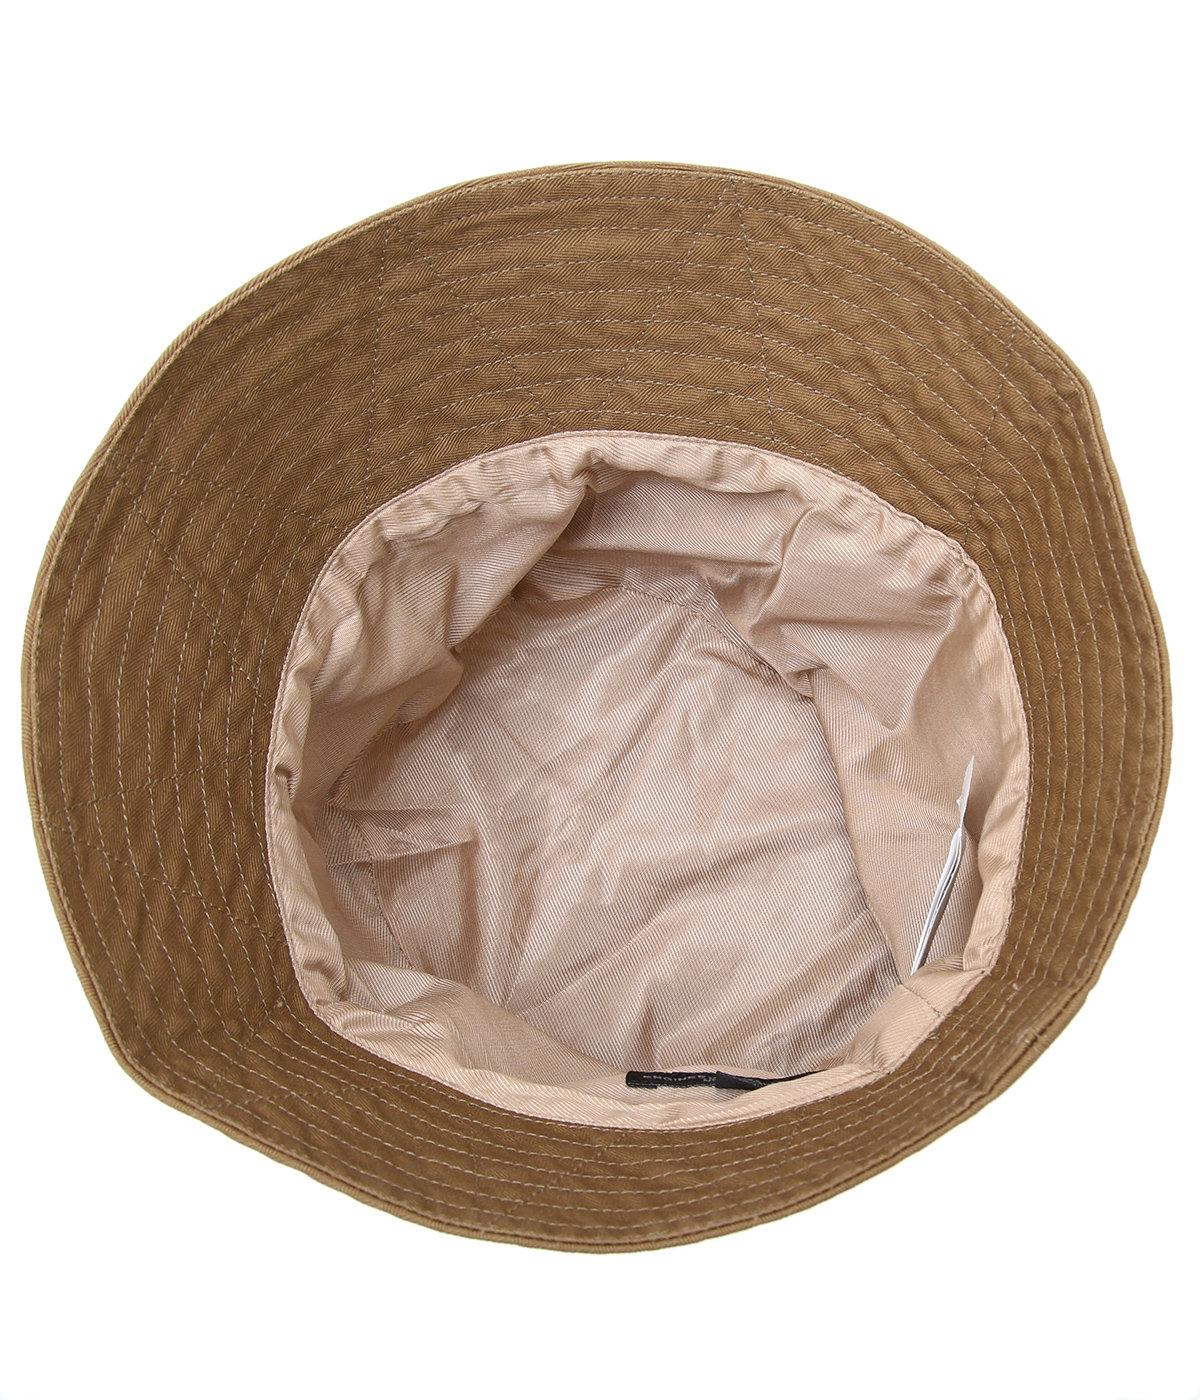 Bucket Hat - HB Twill